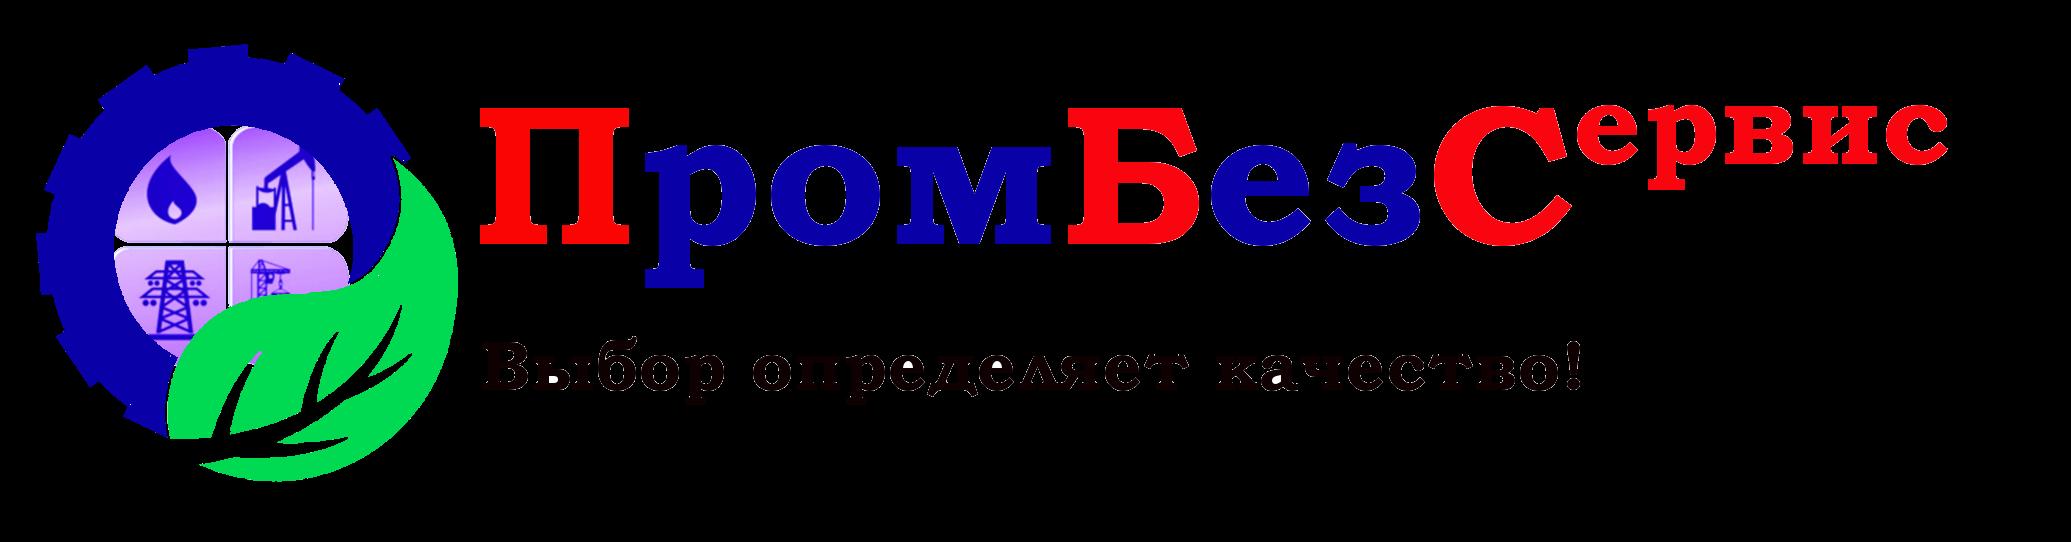 "ООО ""ПромБезСервис"" выбор определяет качество!"